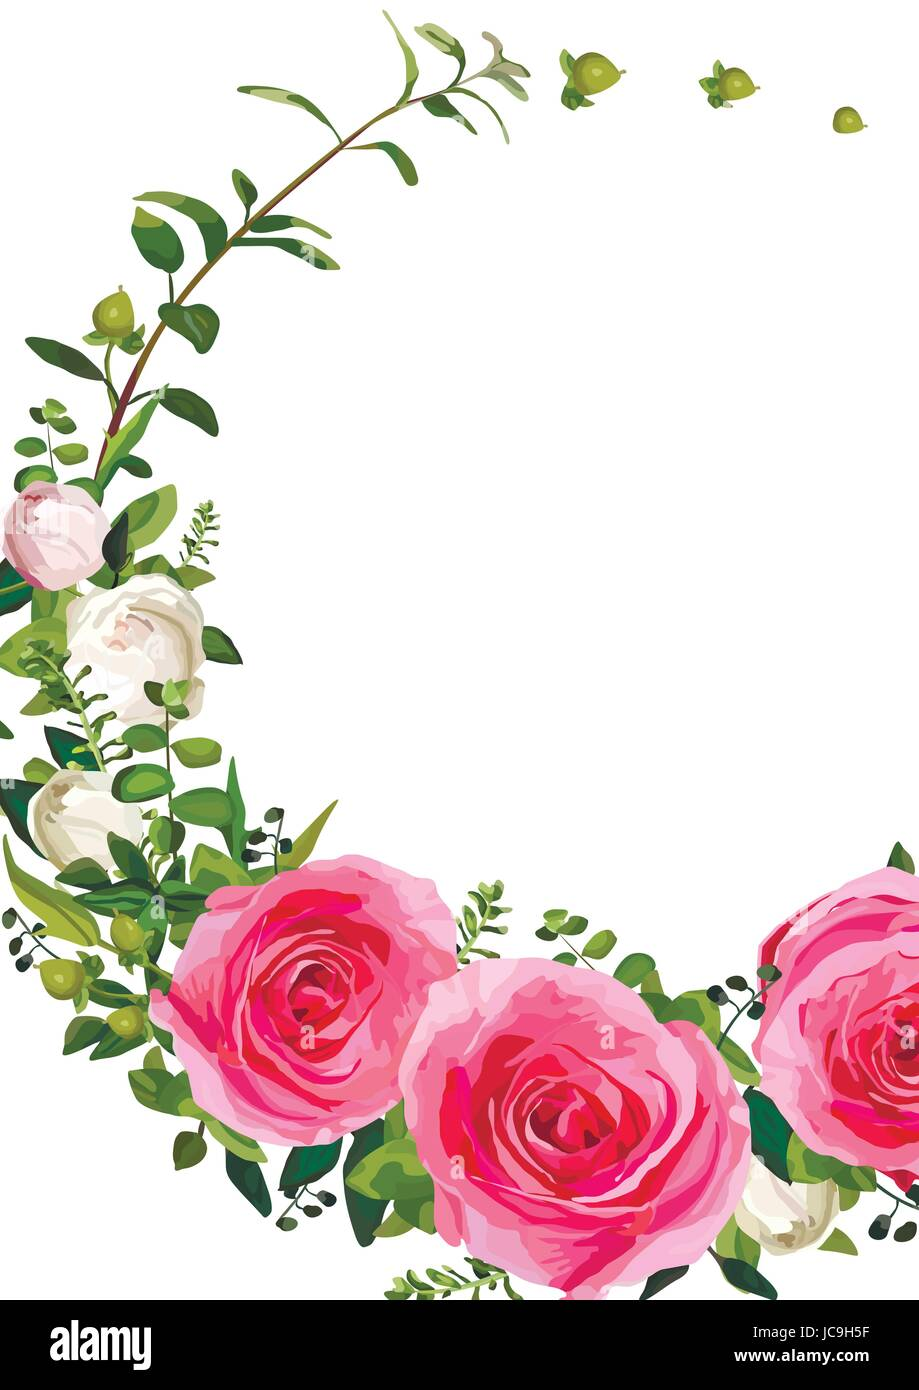 Flower Wreath Flowers Pink Rose Leaves Beautiful Lovely Spring